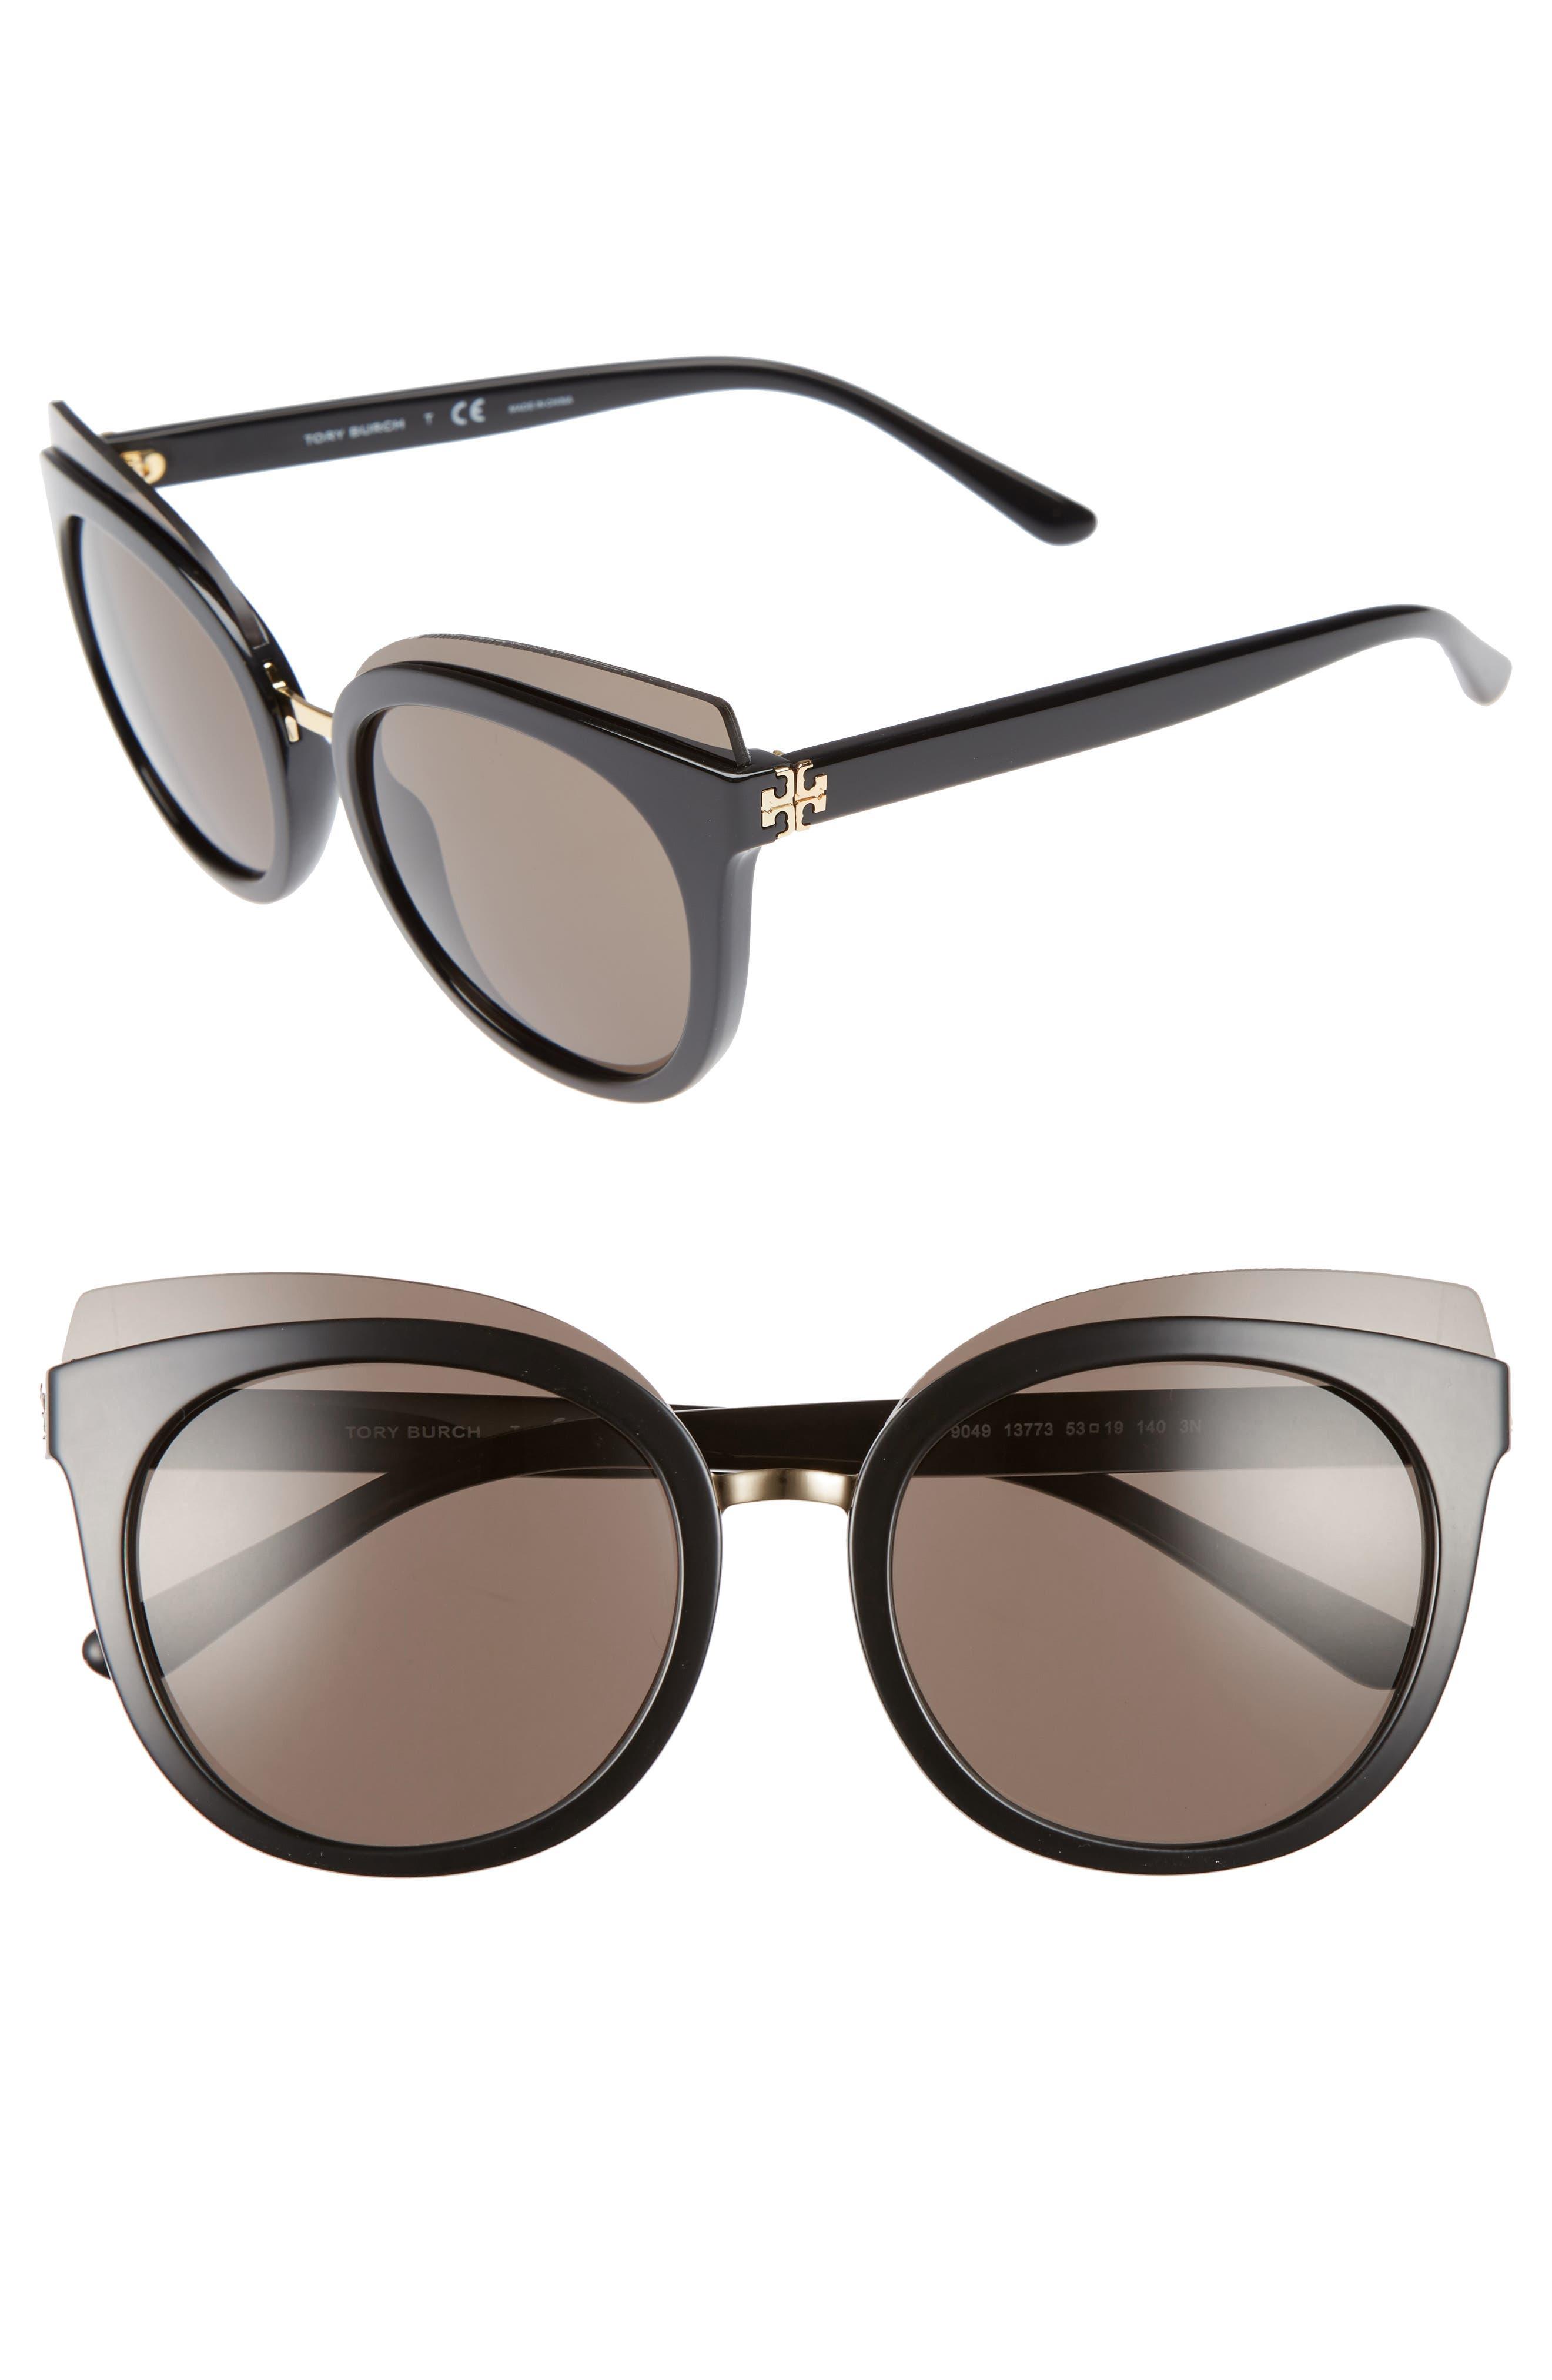 Tory Burch 53mm Cat Eye Sunglasses